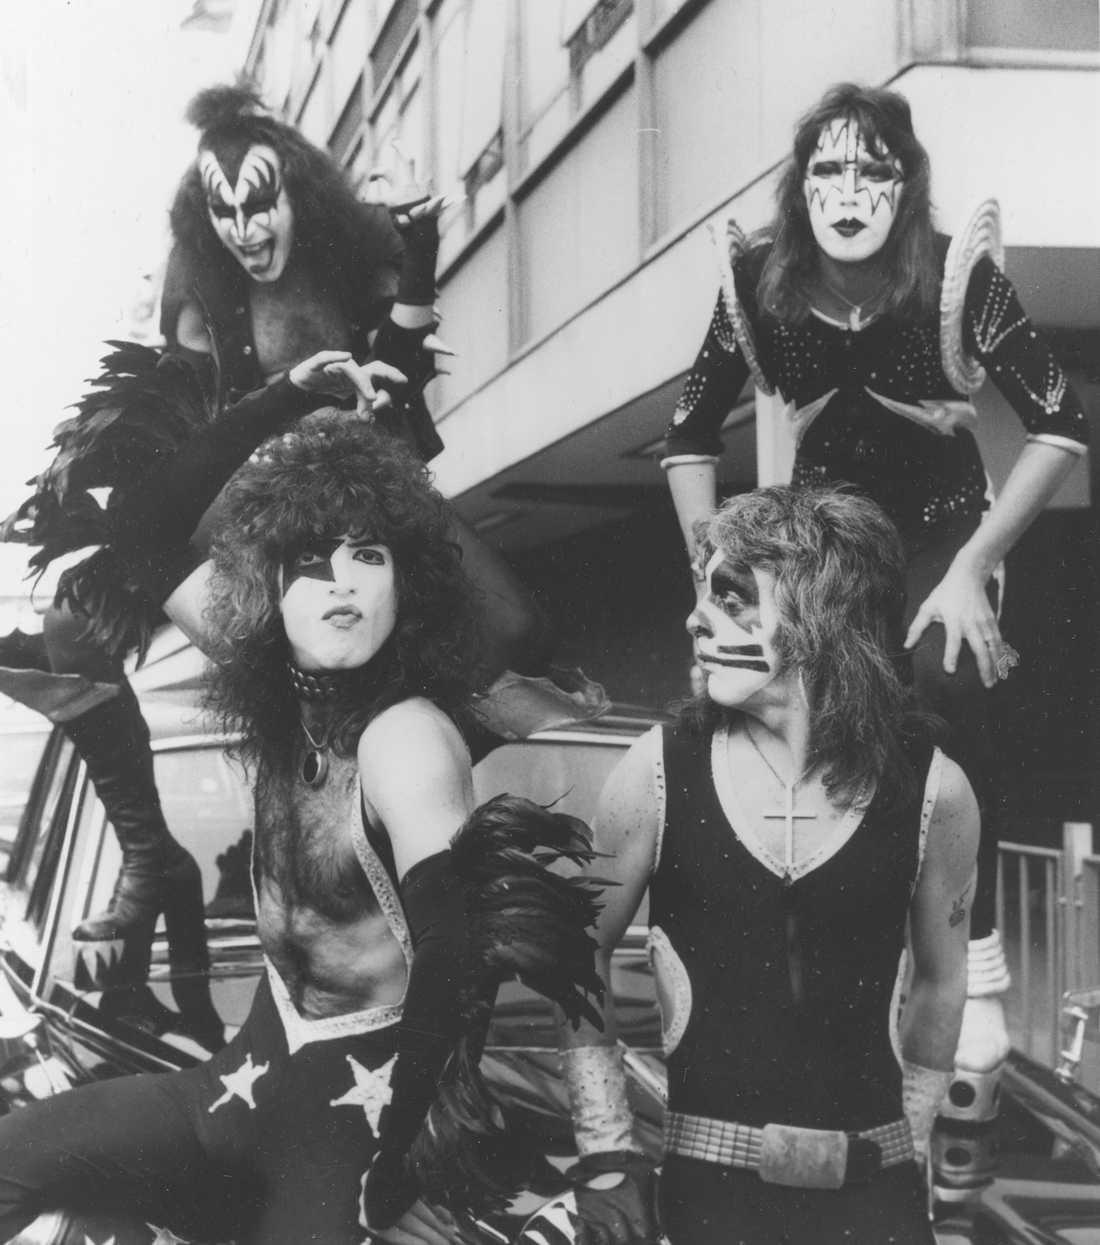 Kiss på Heathrow  i London 12 maj 1976: Gene Simmons, Ace Frehley, Paul Stanley och  Peter Criss.